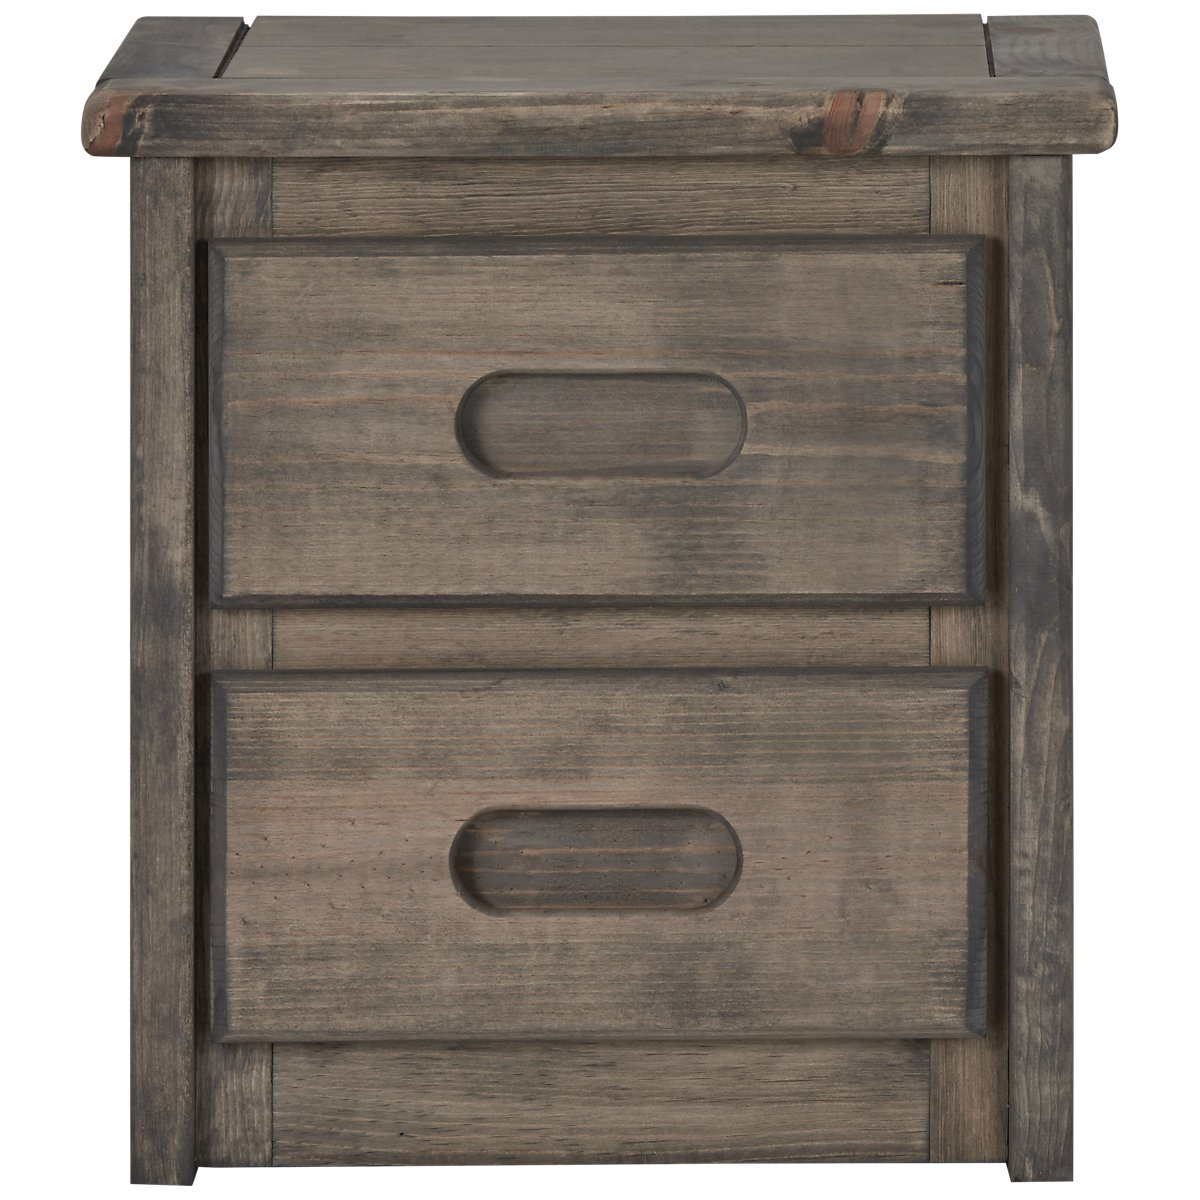 Cinnamon Gray Wood Nightstand